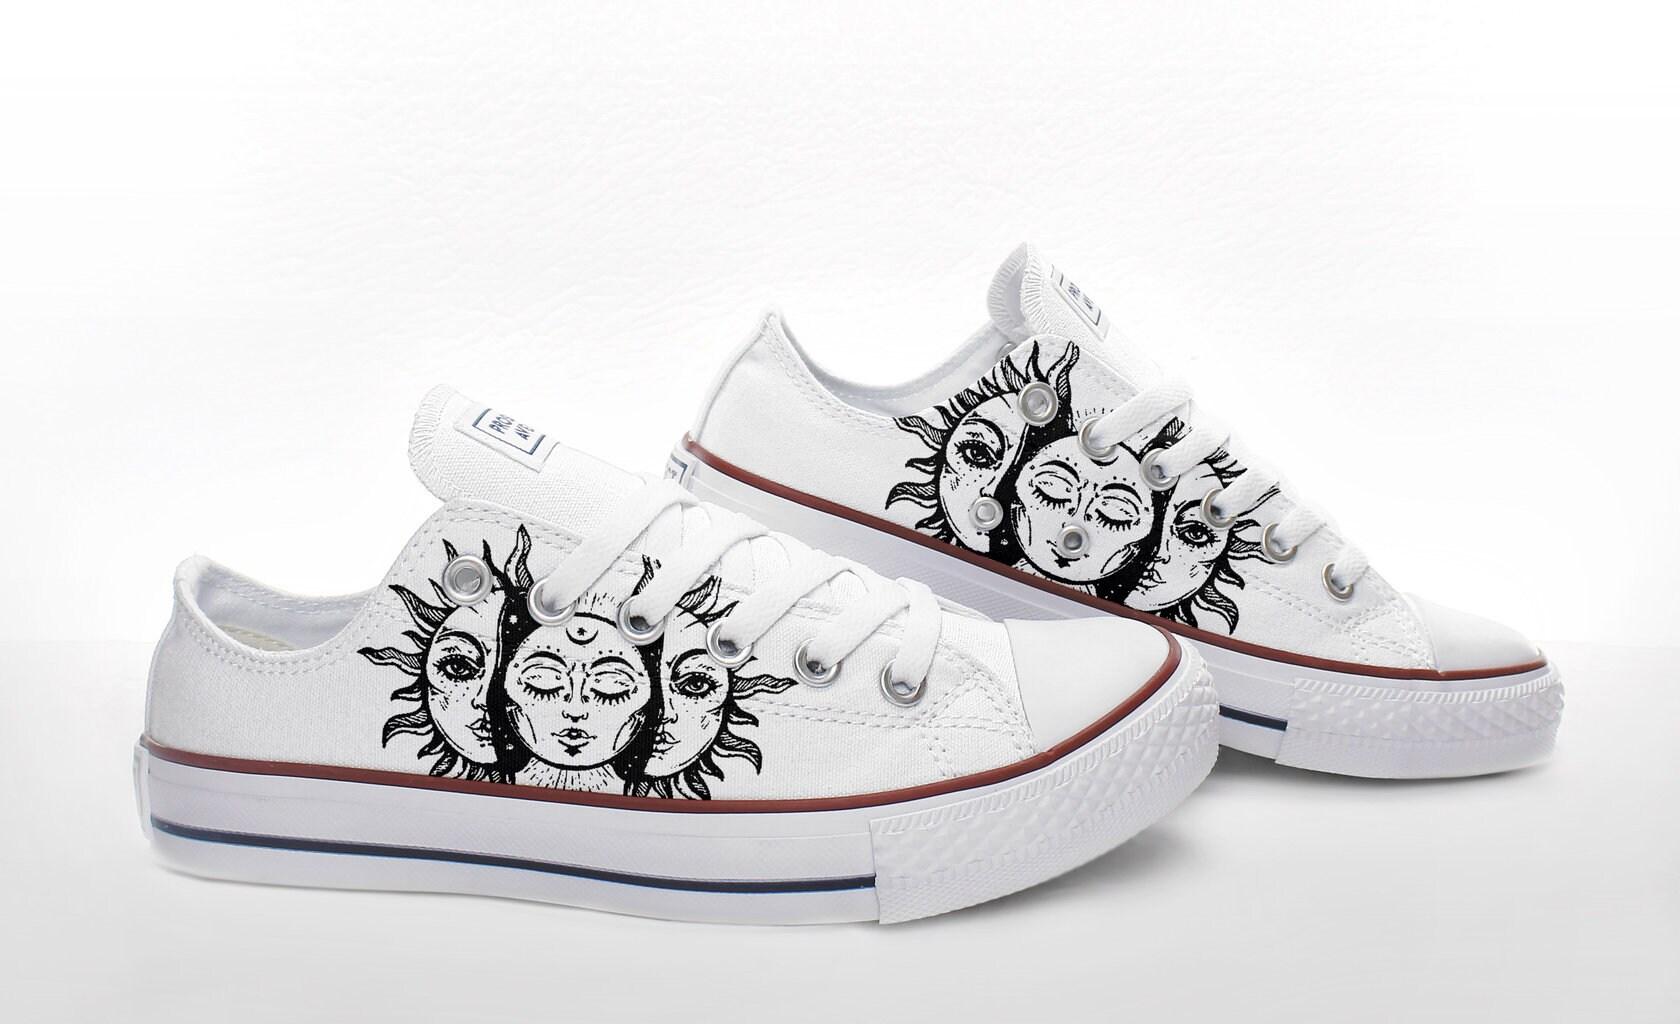 a43da267a180e Sun Custom Canvas Sneakers based on PROSPECT AVENUE White Low Top shoes for  Ari